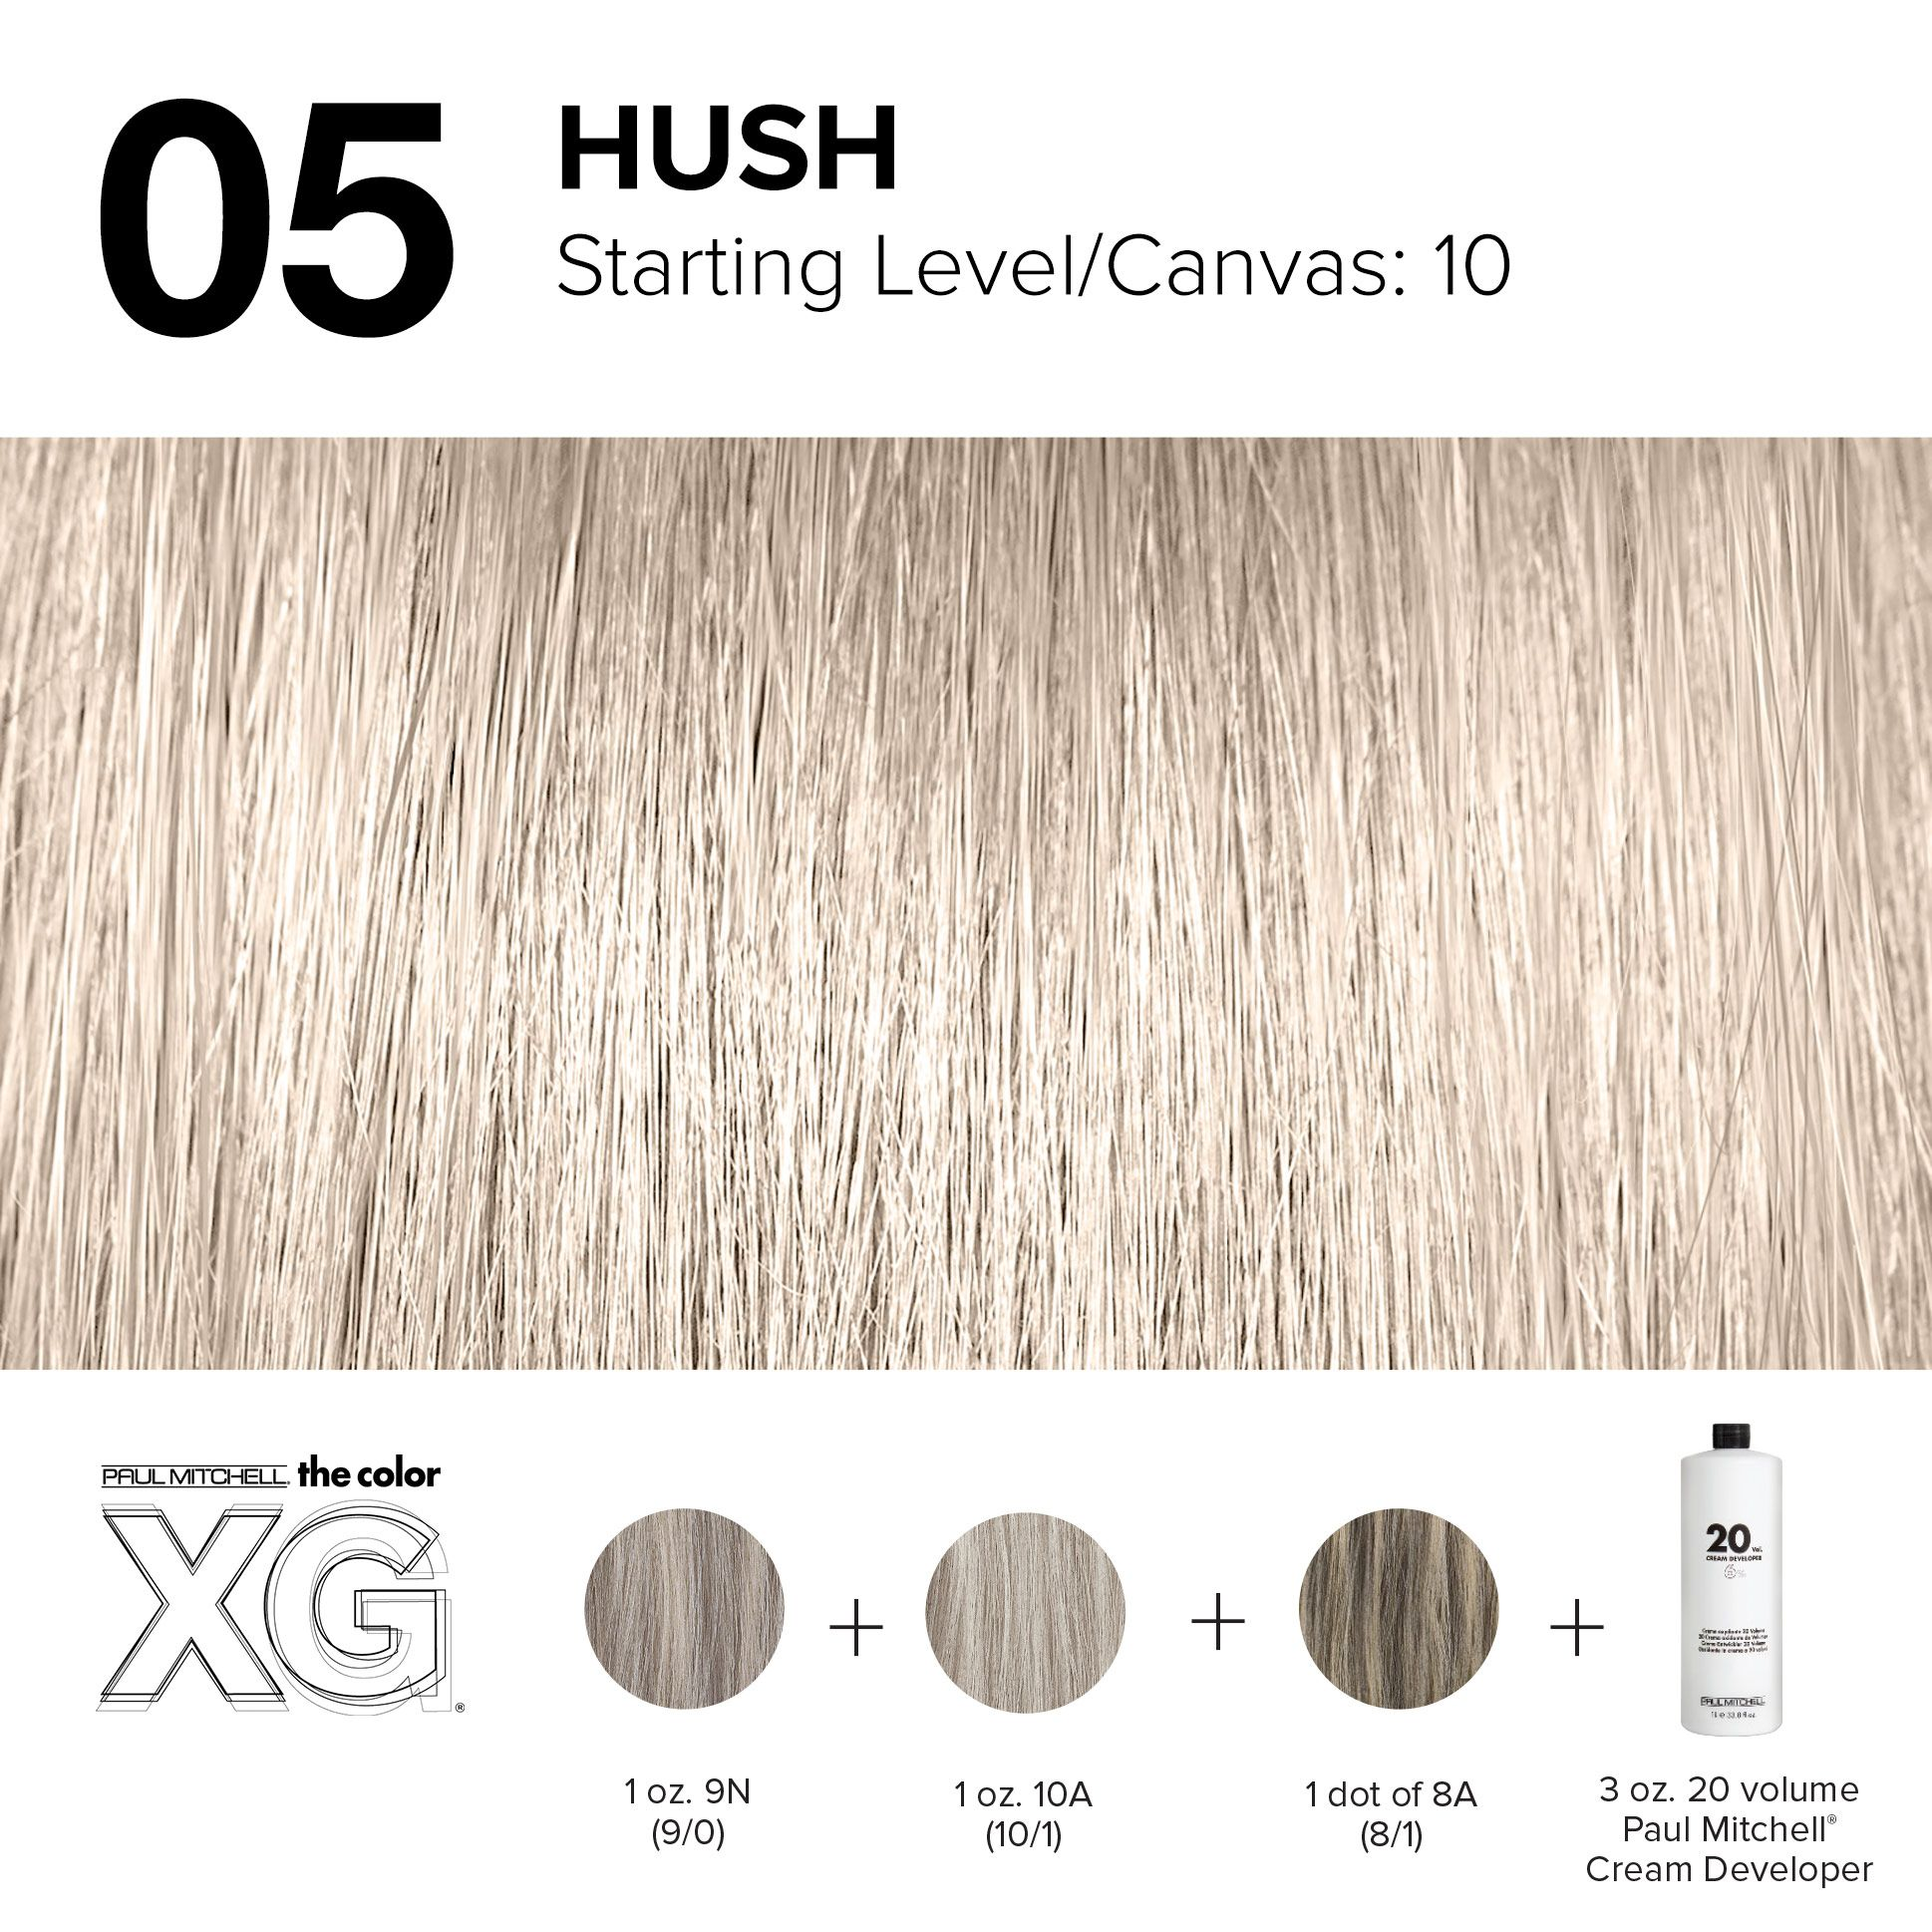 05 Hush Paul Mitchell Color Hair Color Formulas Paul Mitchell